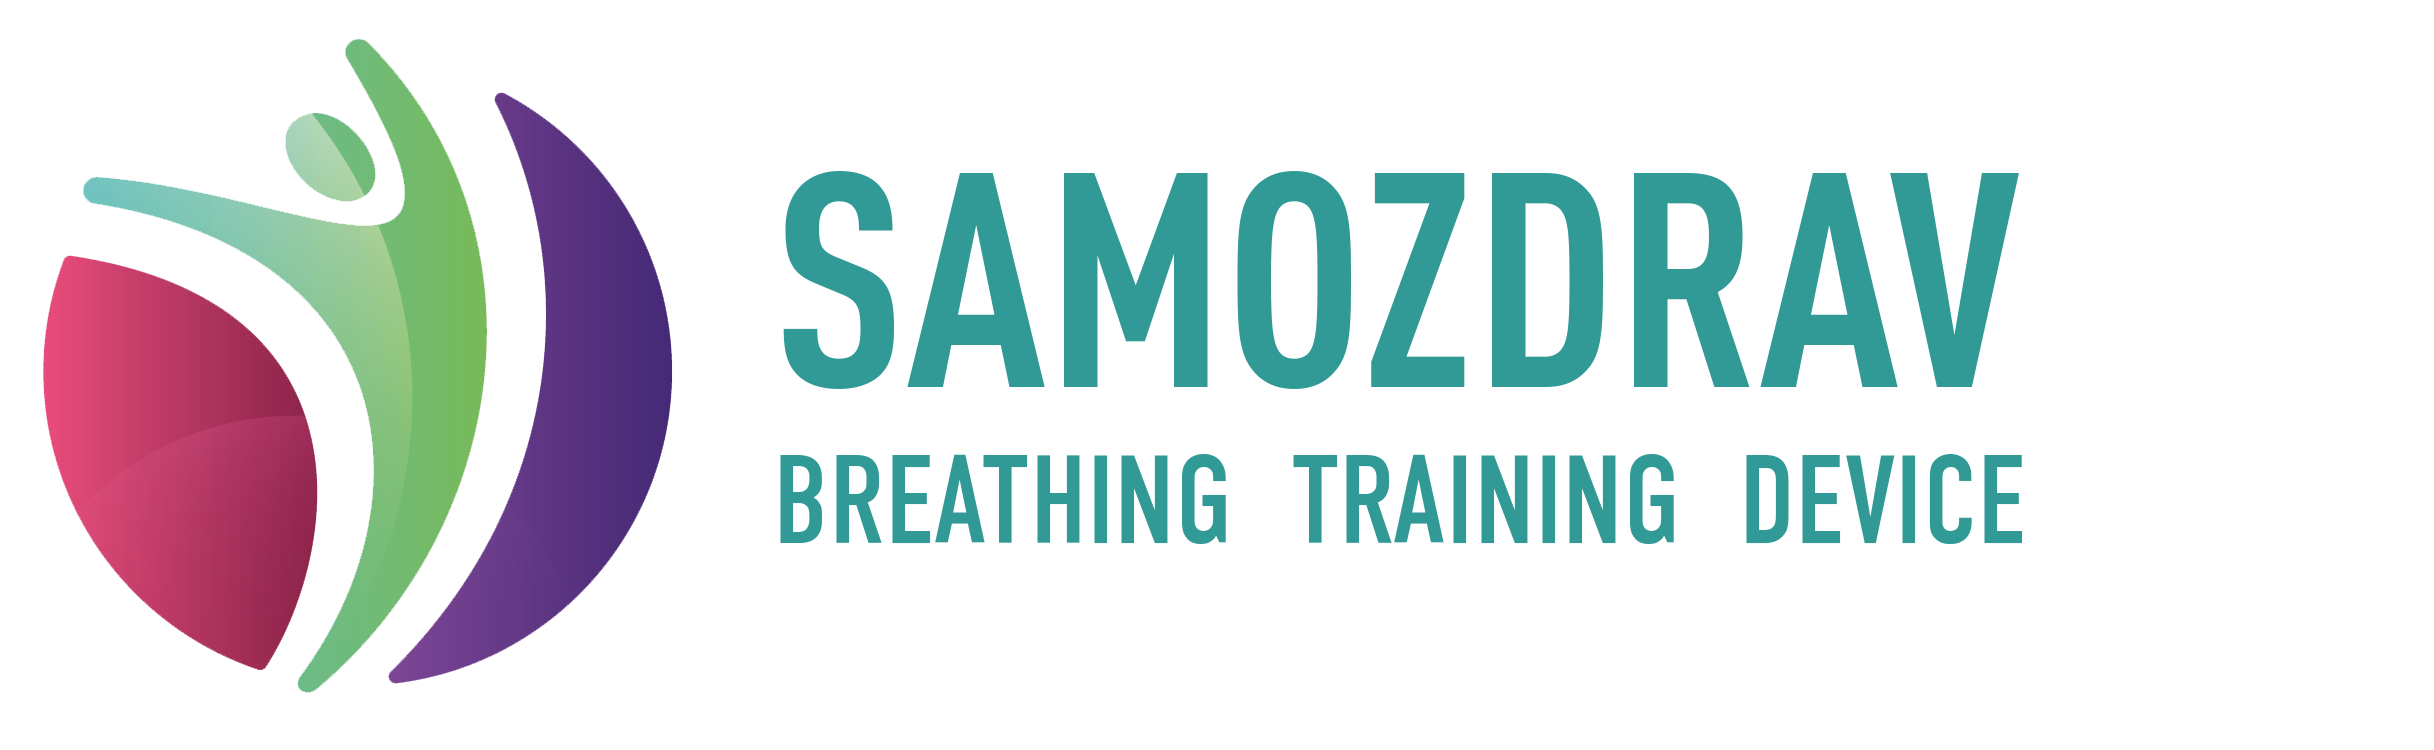 Samozdrav – Appareil d'entraînement respiratoire